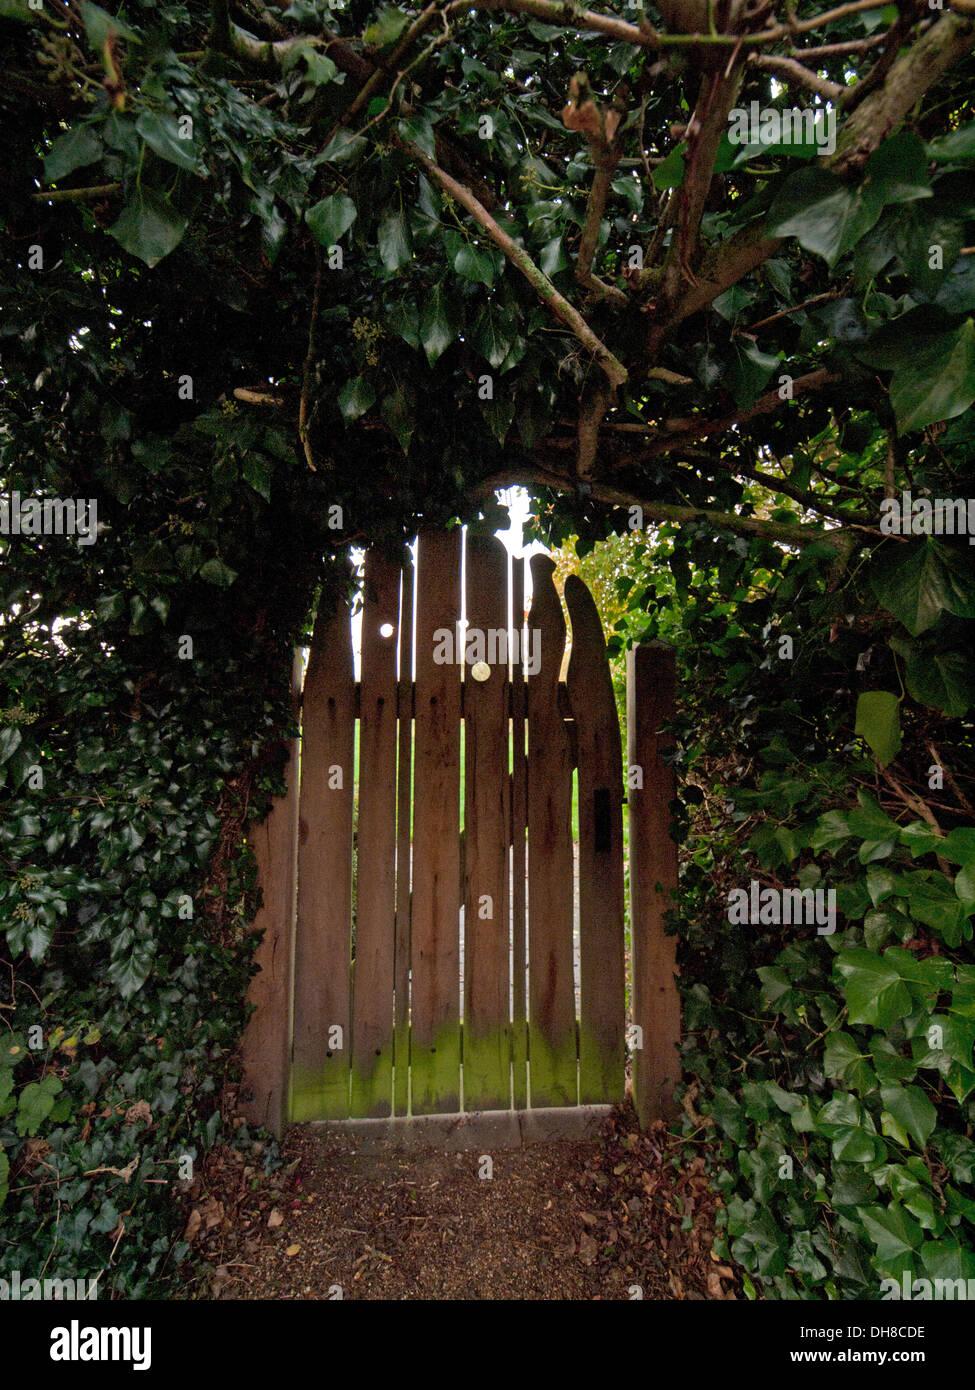 Wooden Garden Gate Stock Photos & Wooden Garden Gate Stock Images ...